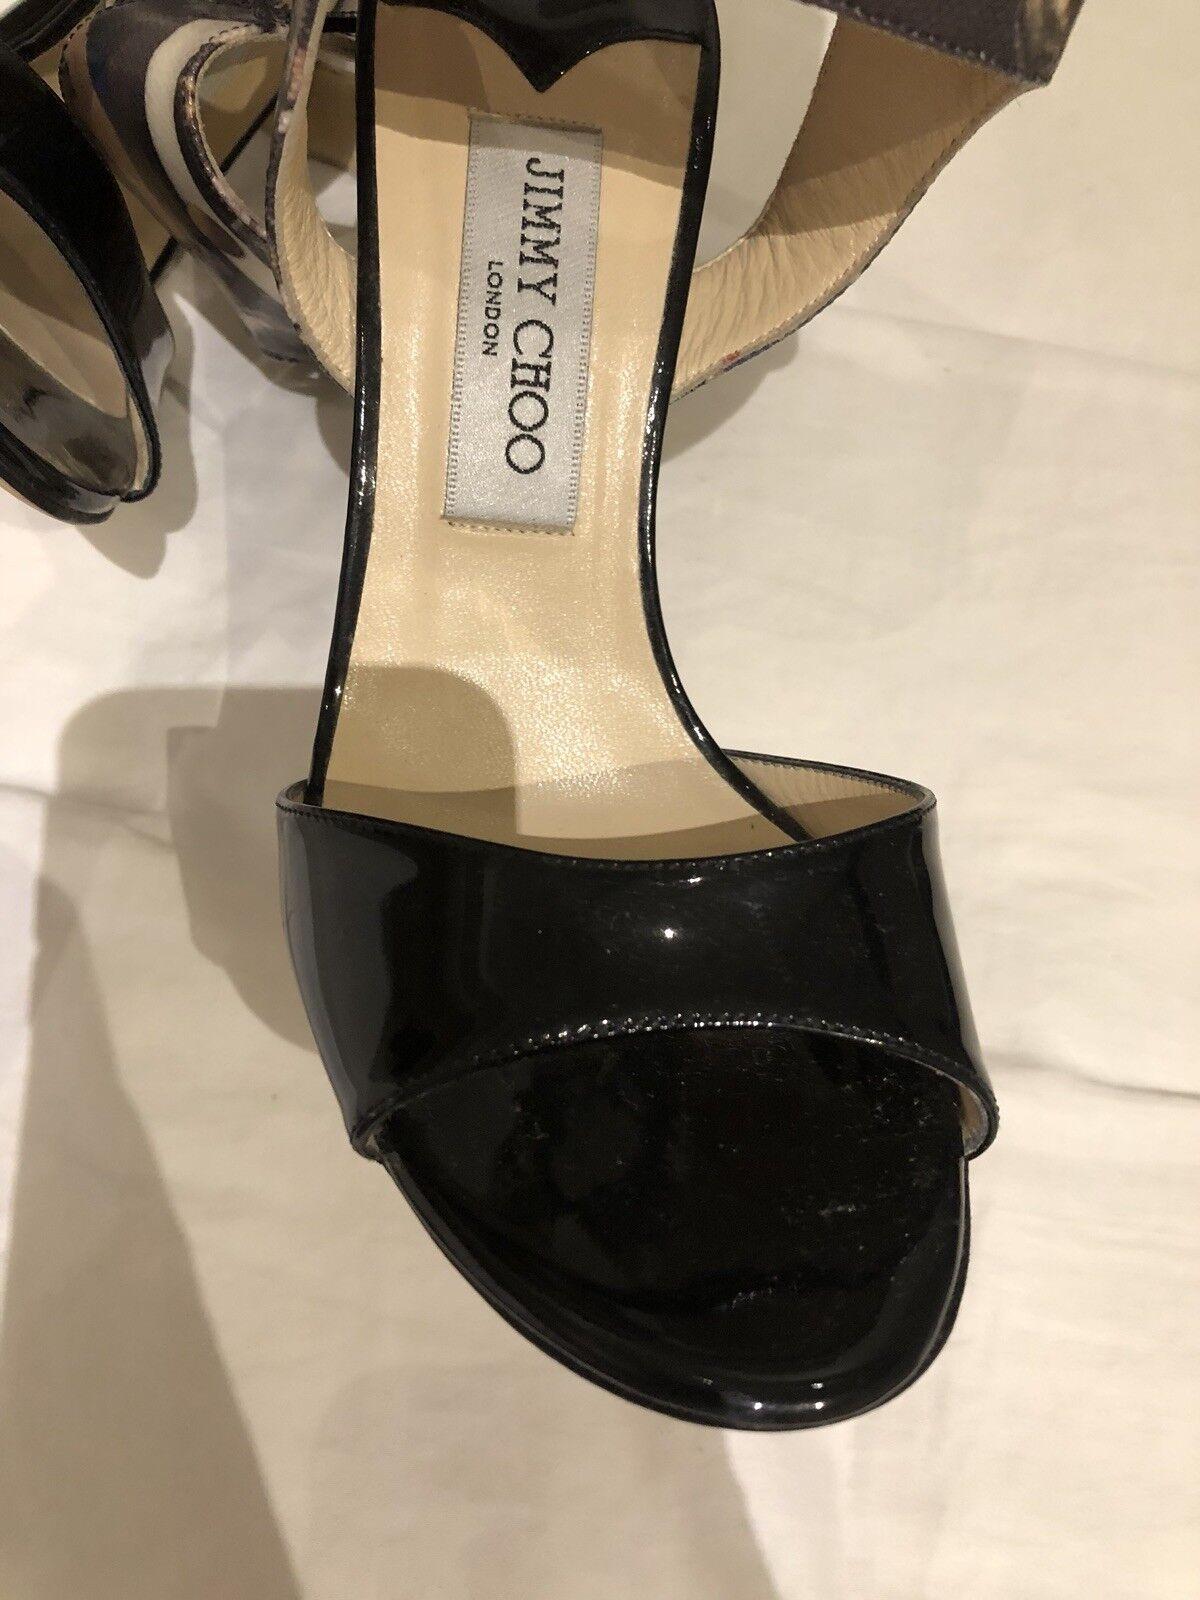 Nuevo Jimmy Choo Choo Choo Charol Negro Correa De Tobillo Peep Toe Sandalia 37.5 US 7.5  centro comercial de moda